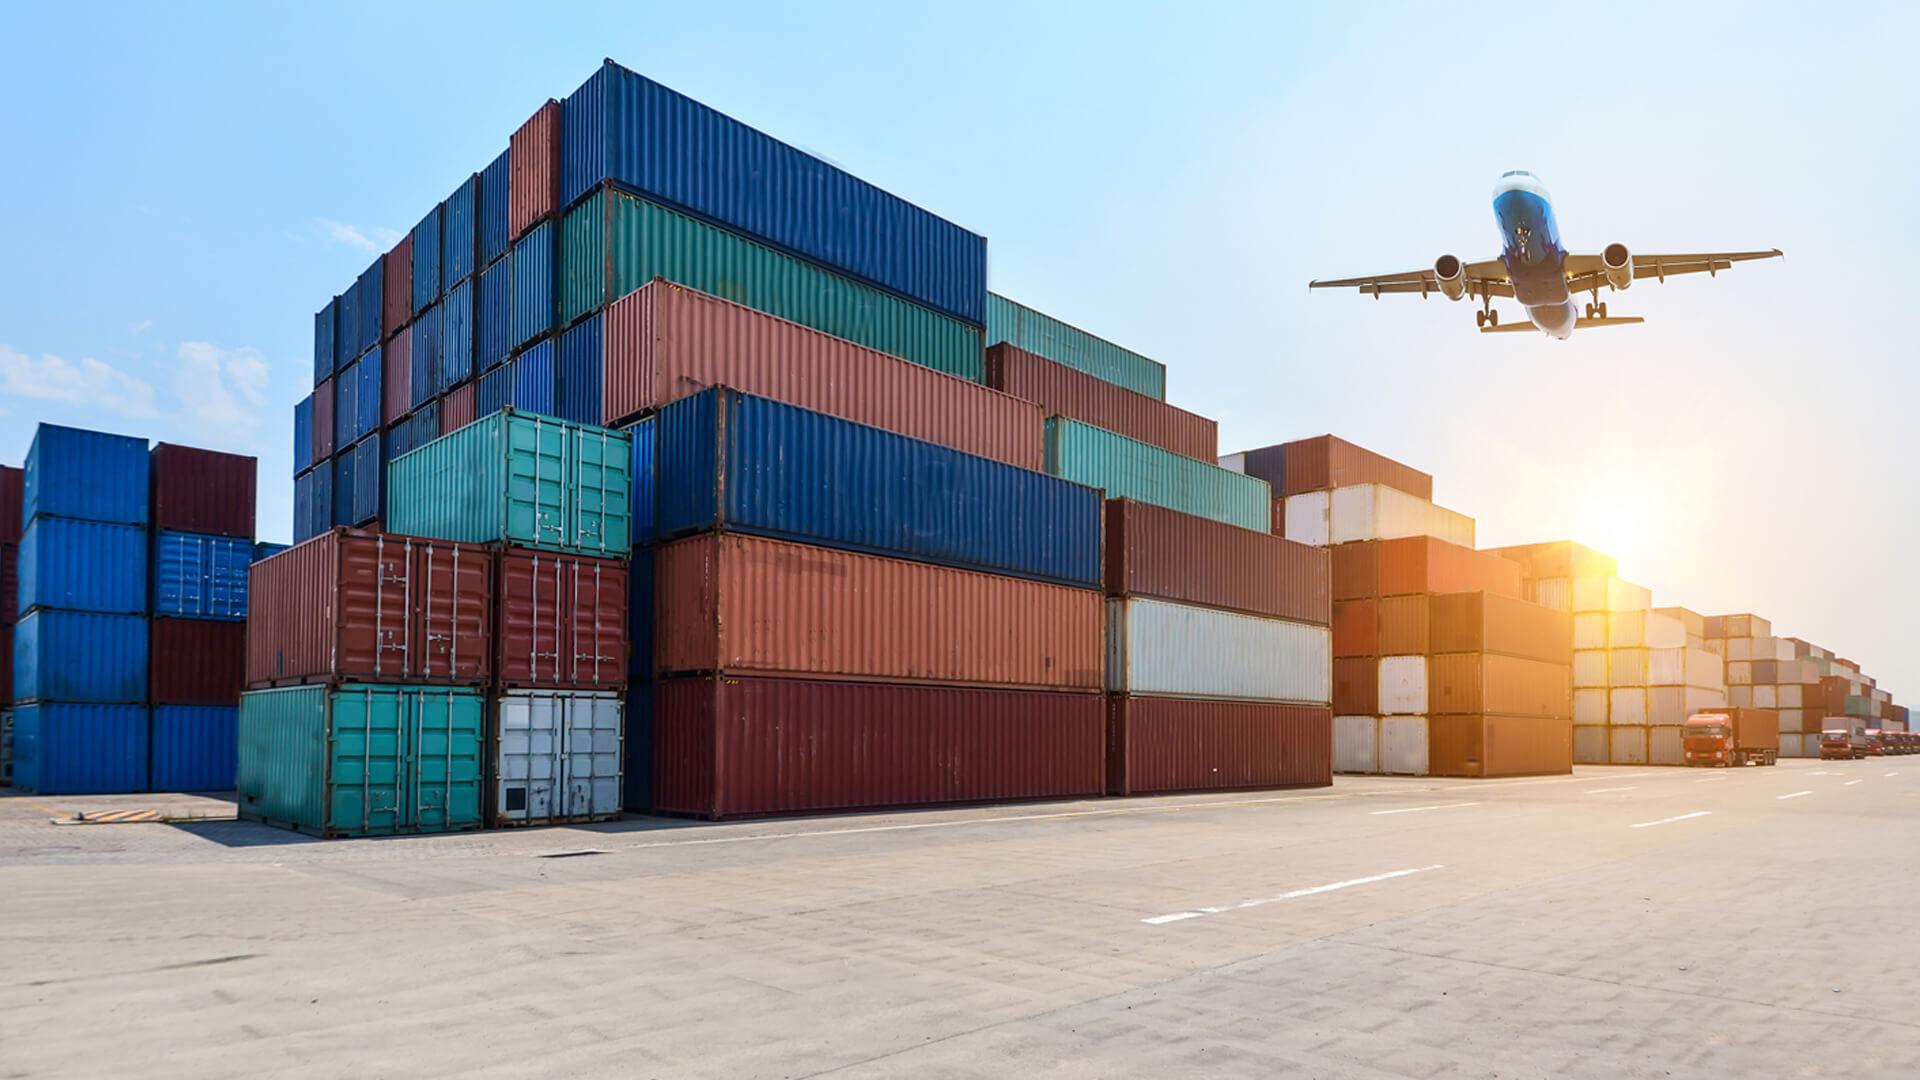 Cargo Insurance 101: The basics